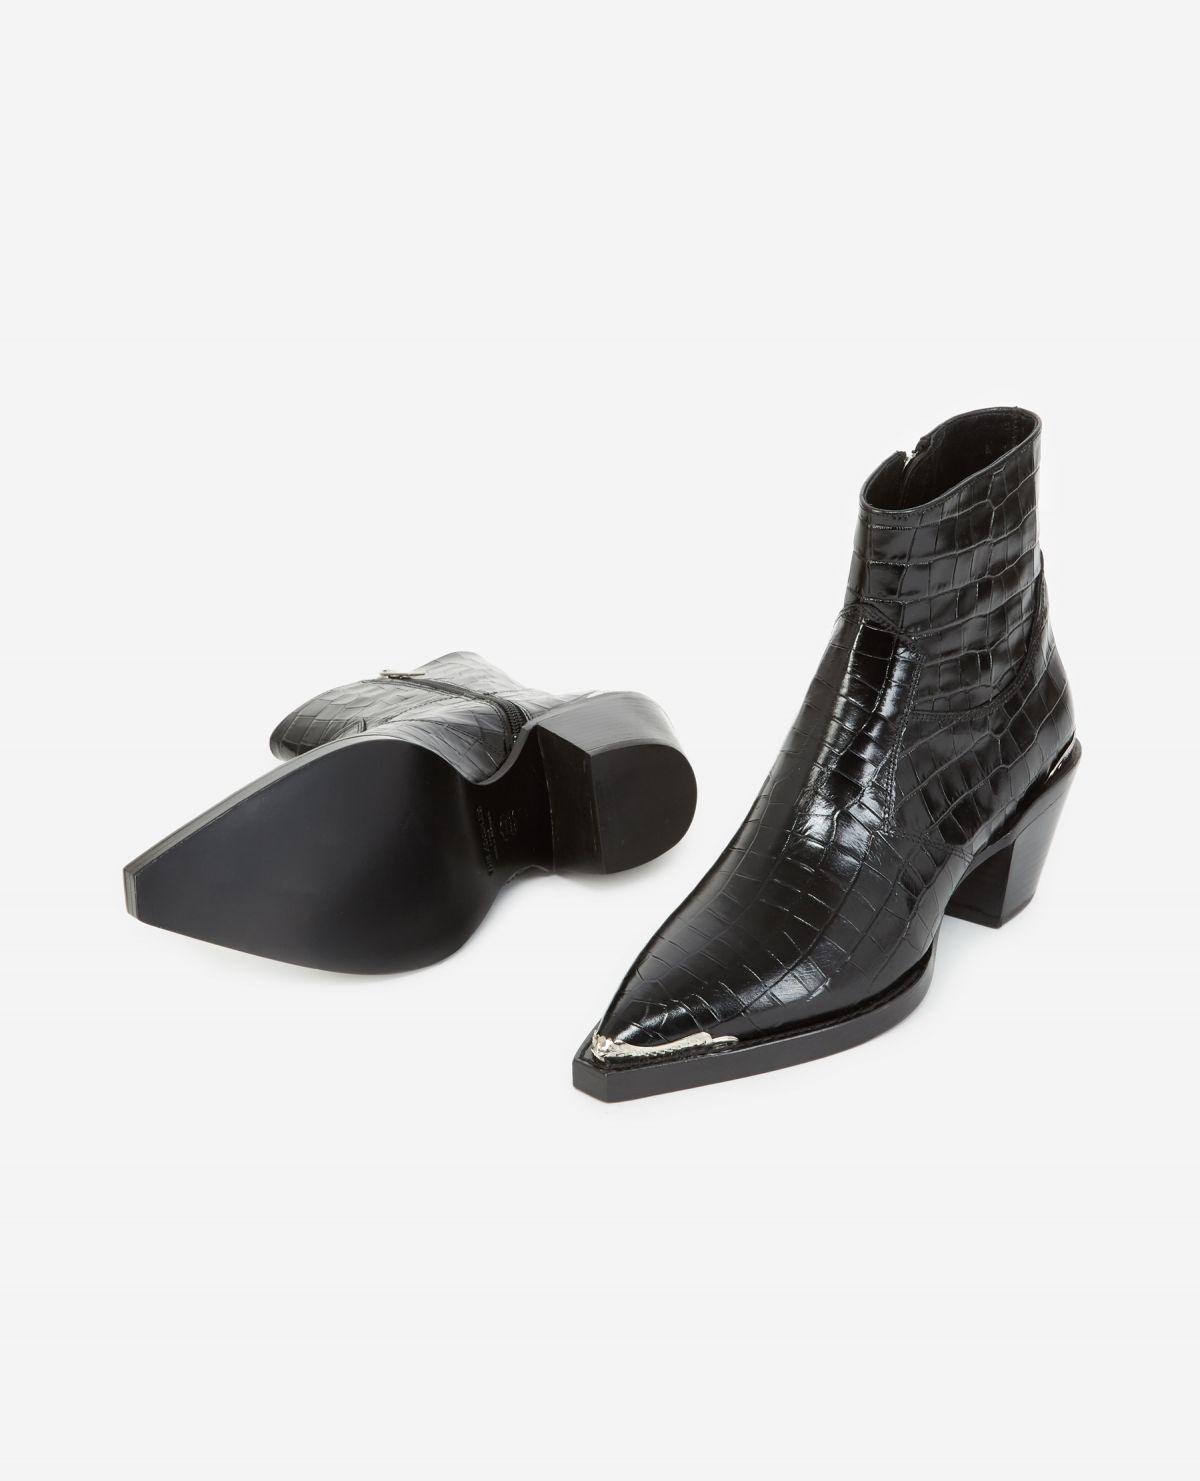 AFCHTHE KOOPLES bottines noires cuir façon croco21055K-9